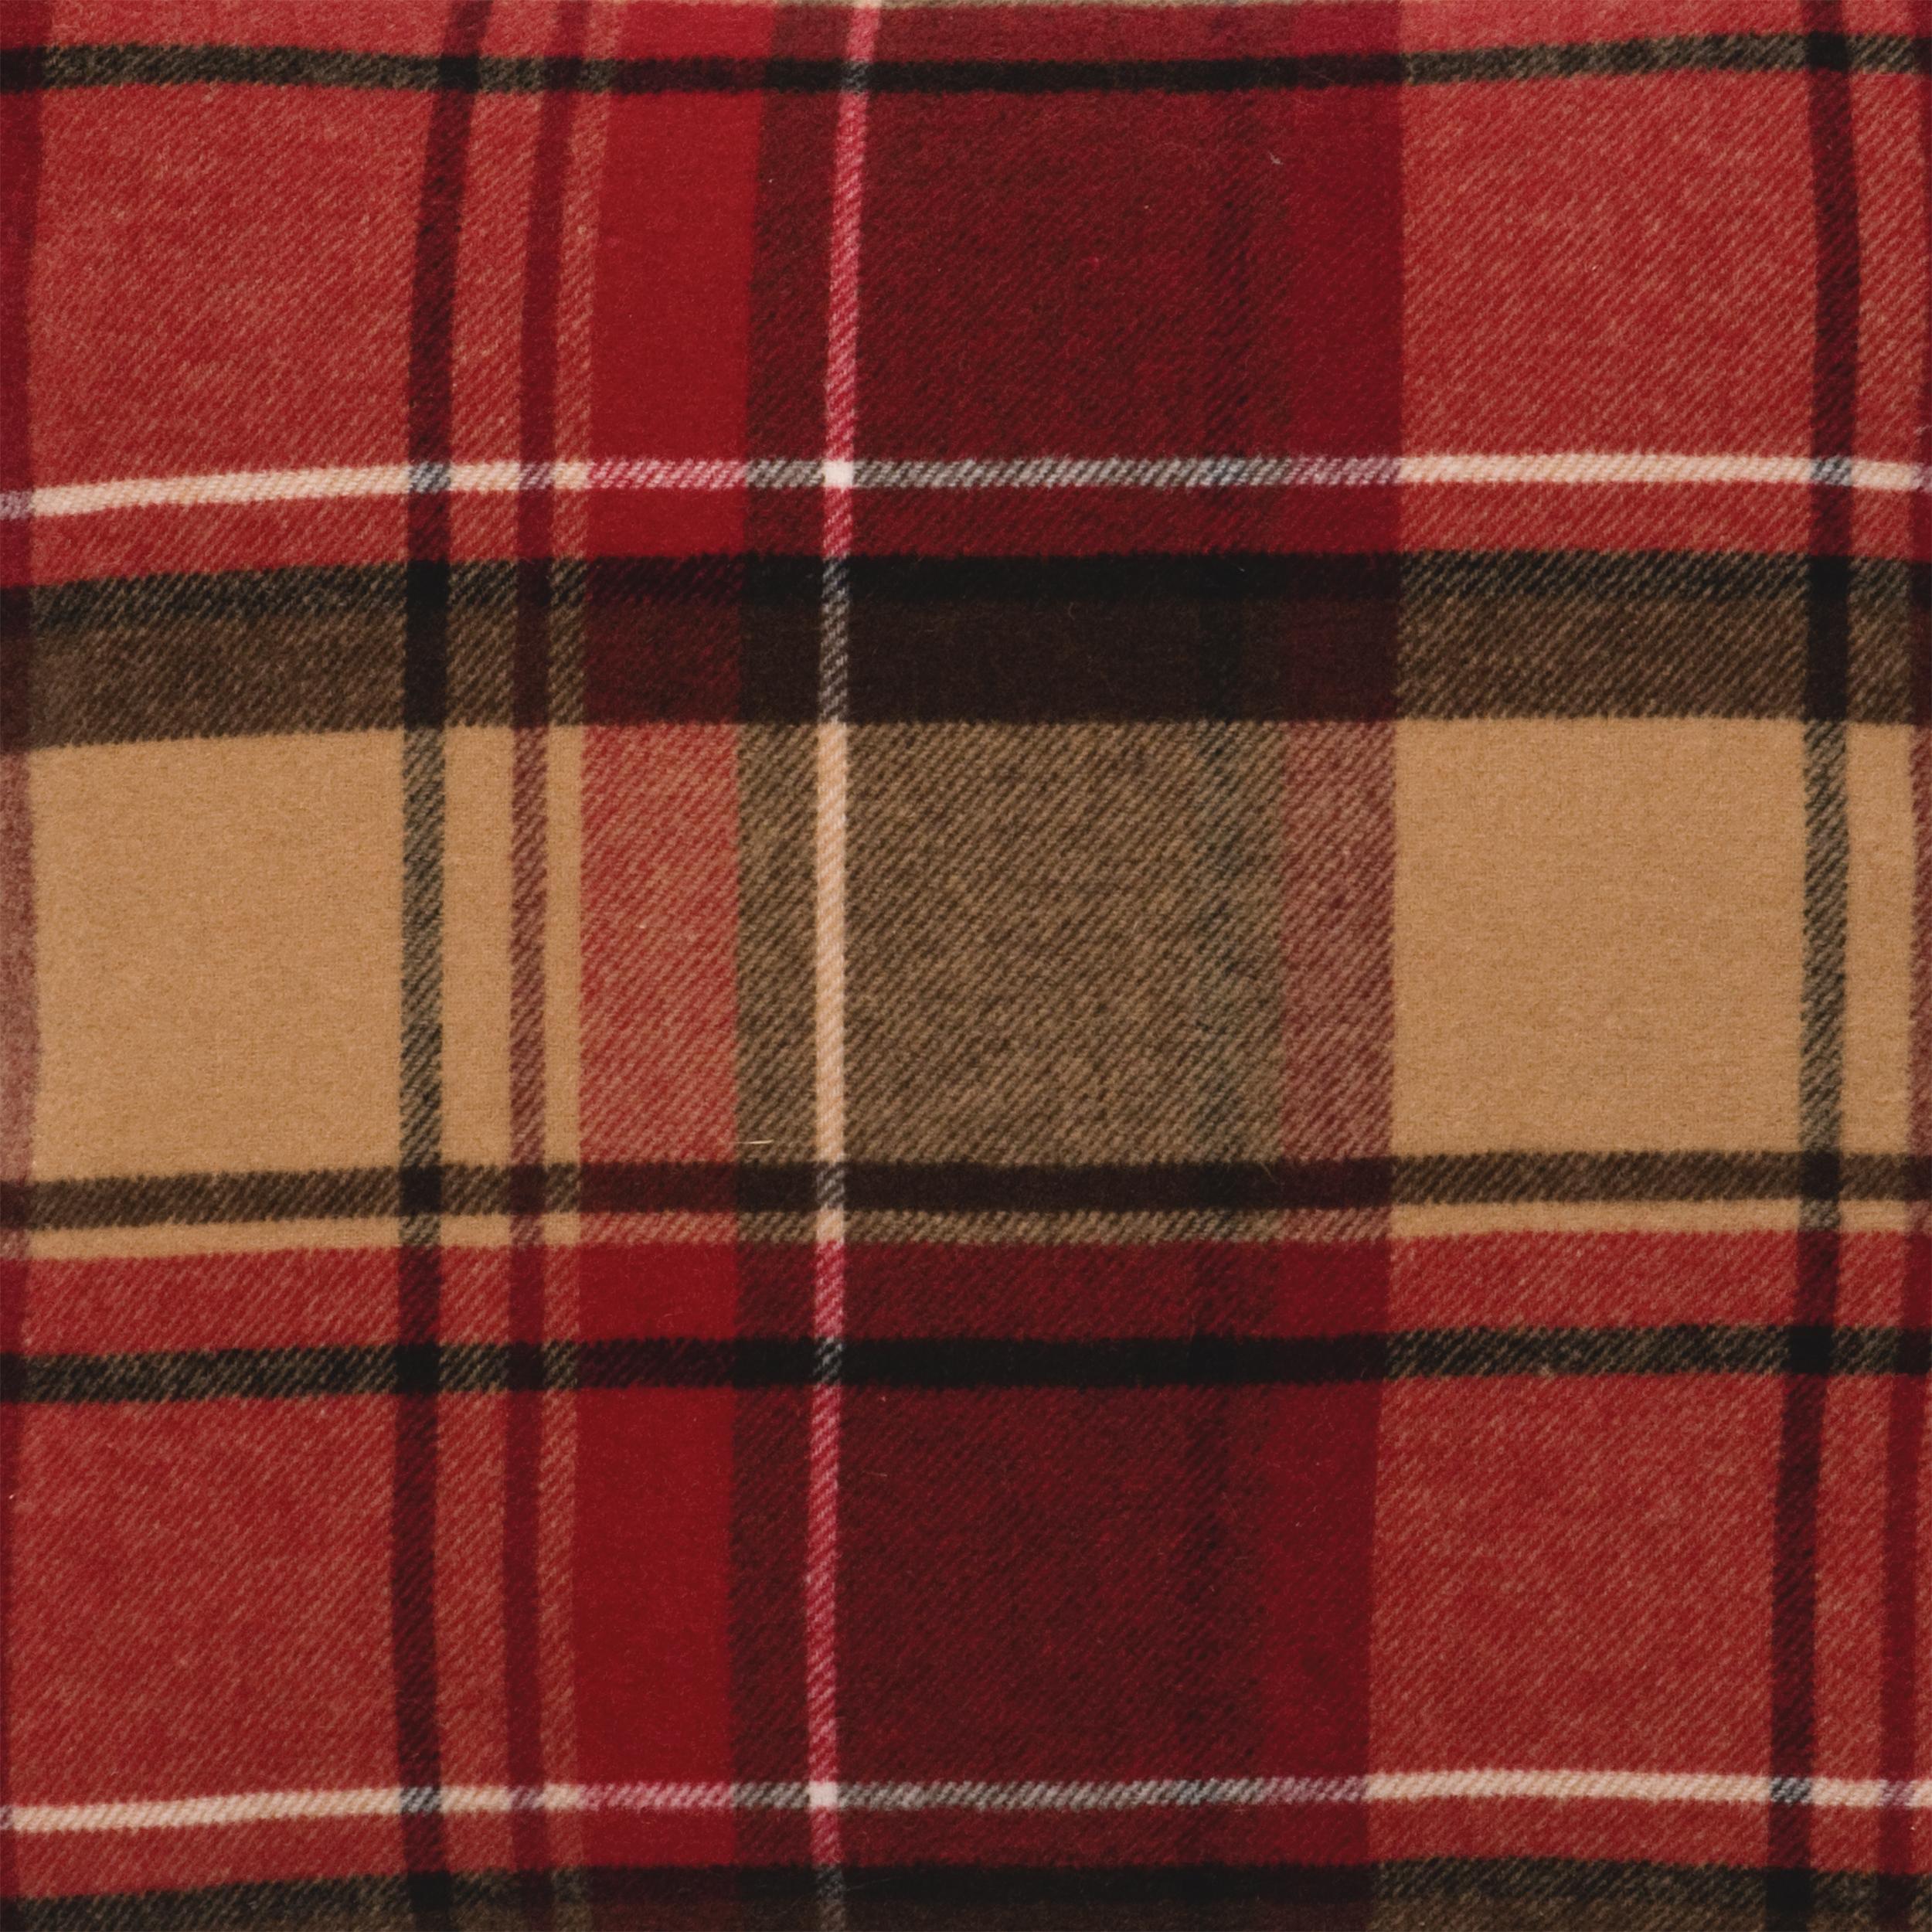 Gunnison (Wool-Blend)